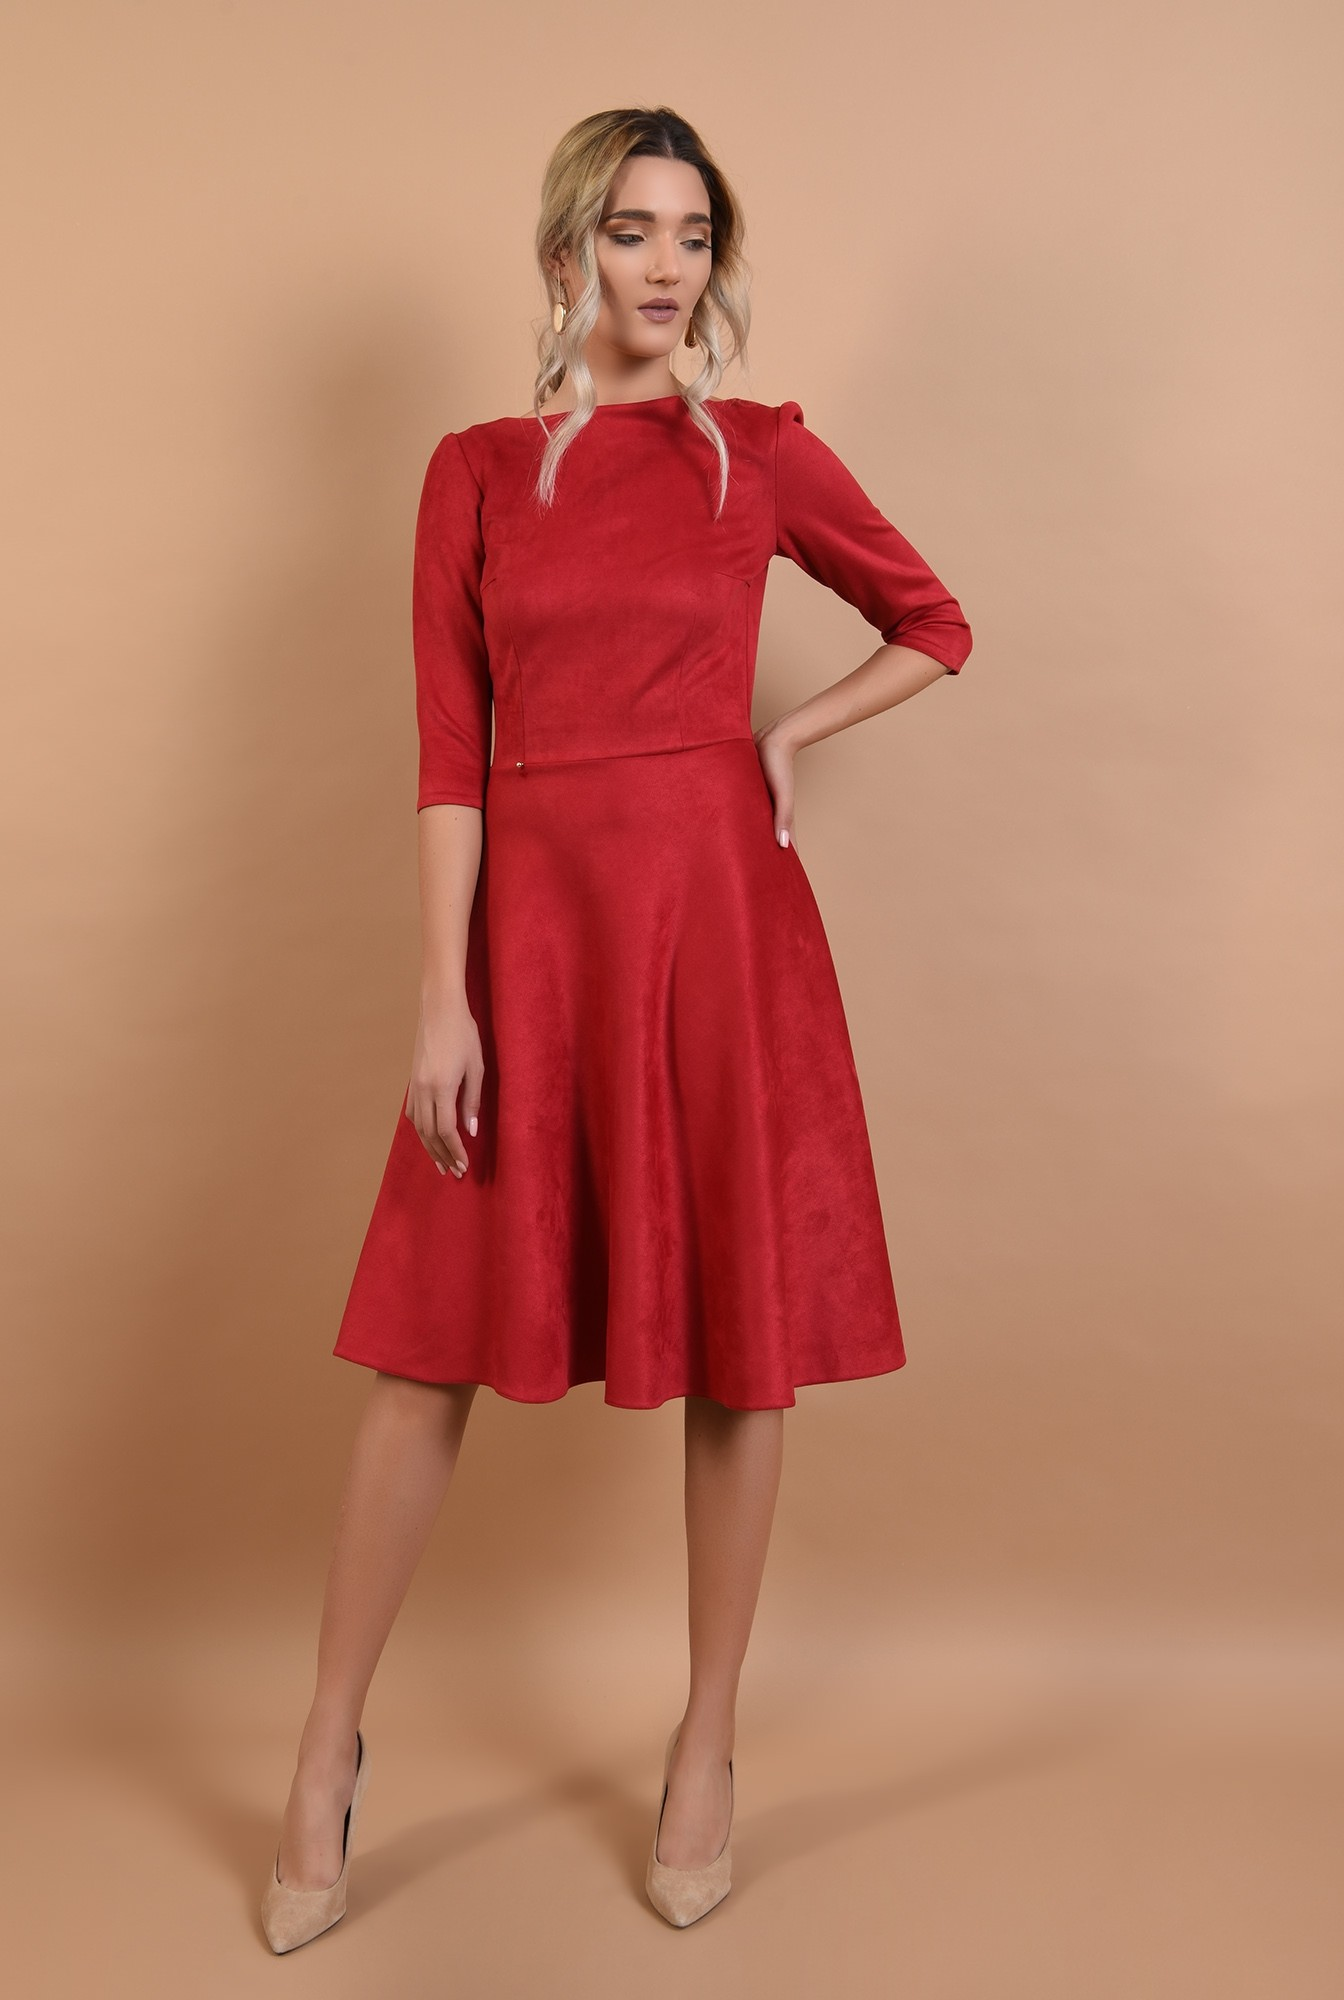 0 - rochie rosie, din piele intoarsa, maneci midi, nasturi aurii la spate, Poema